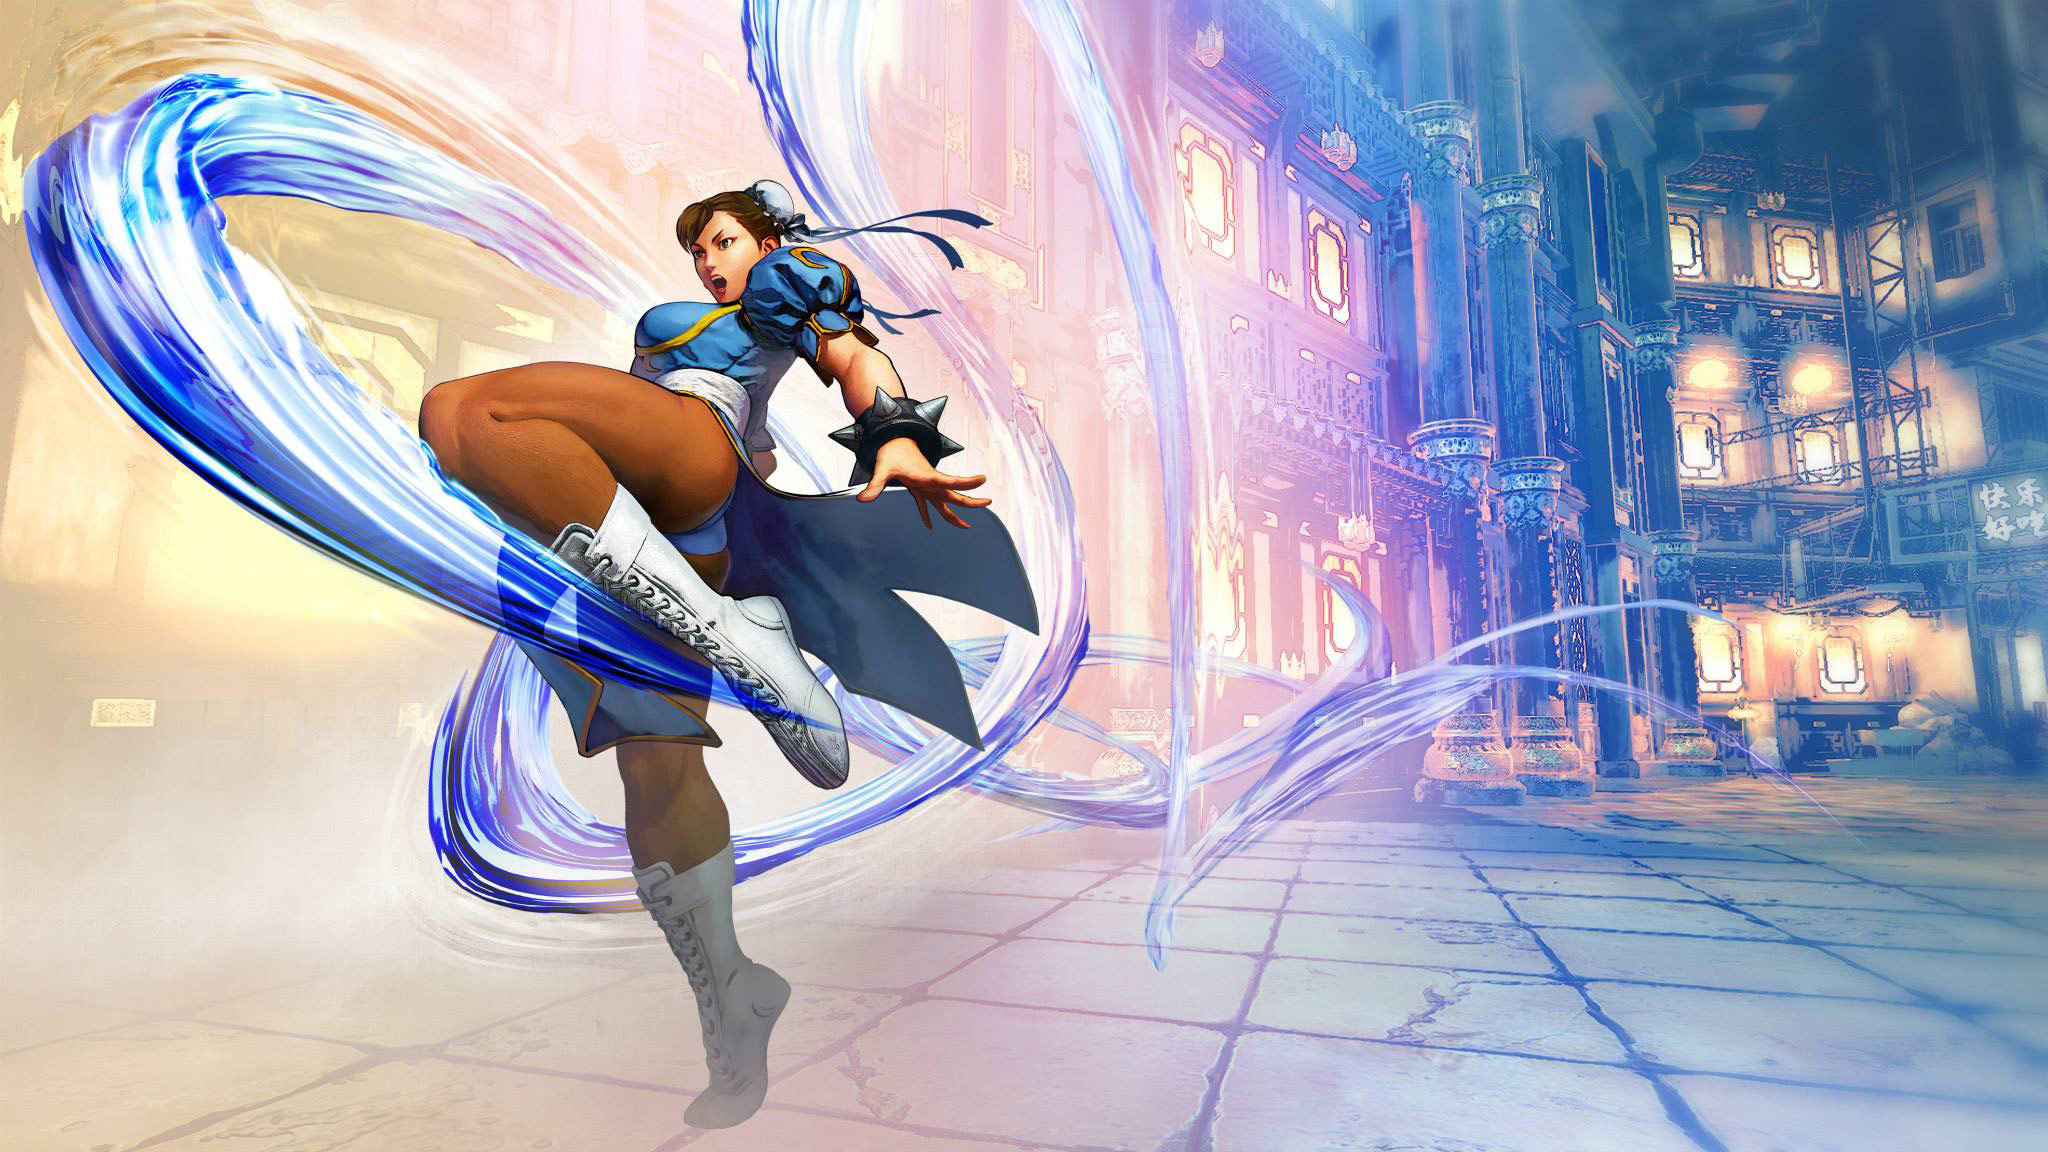 Street Fighter Capcom Video Game Duel Chun Li Womans Tank Sleep Shirt